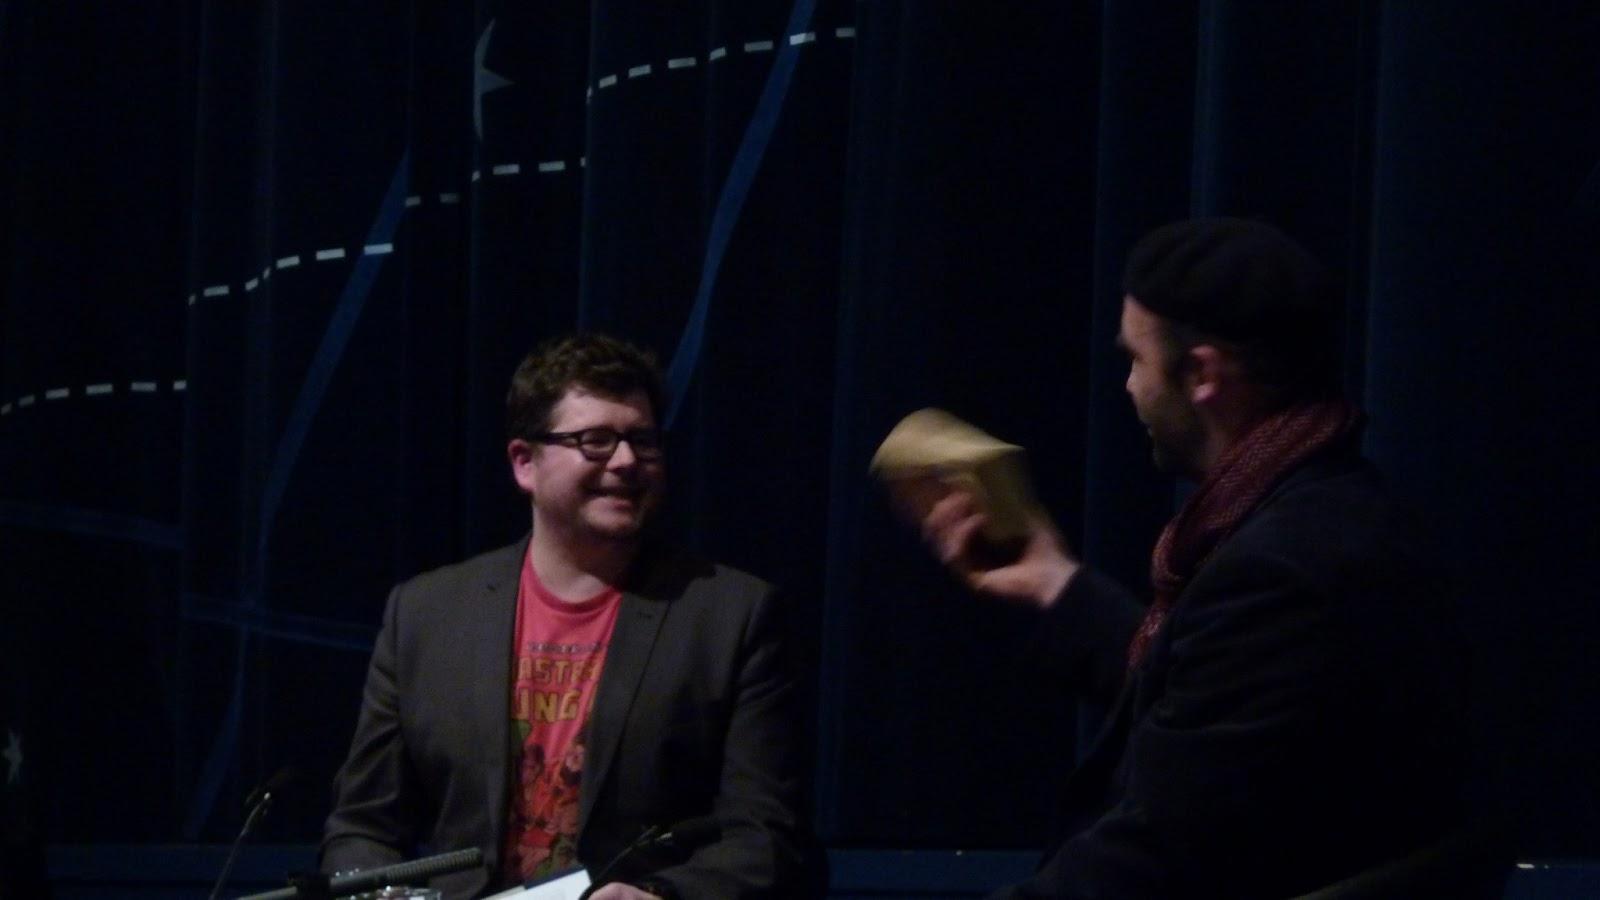 Rory Mccann Kilt Rory gives away his GRRM